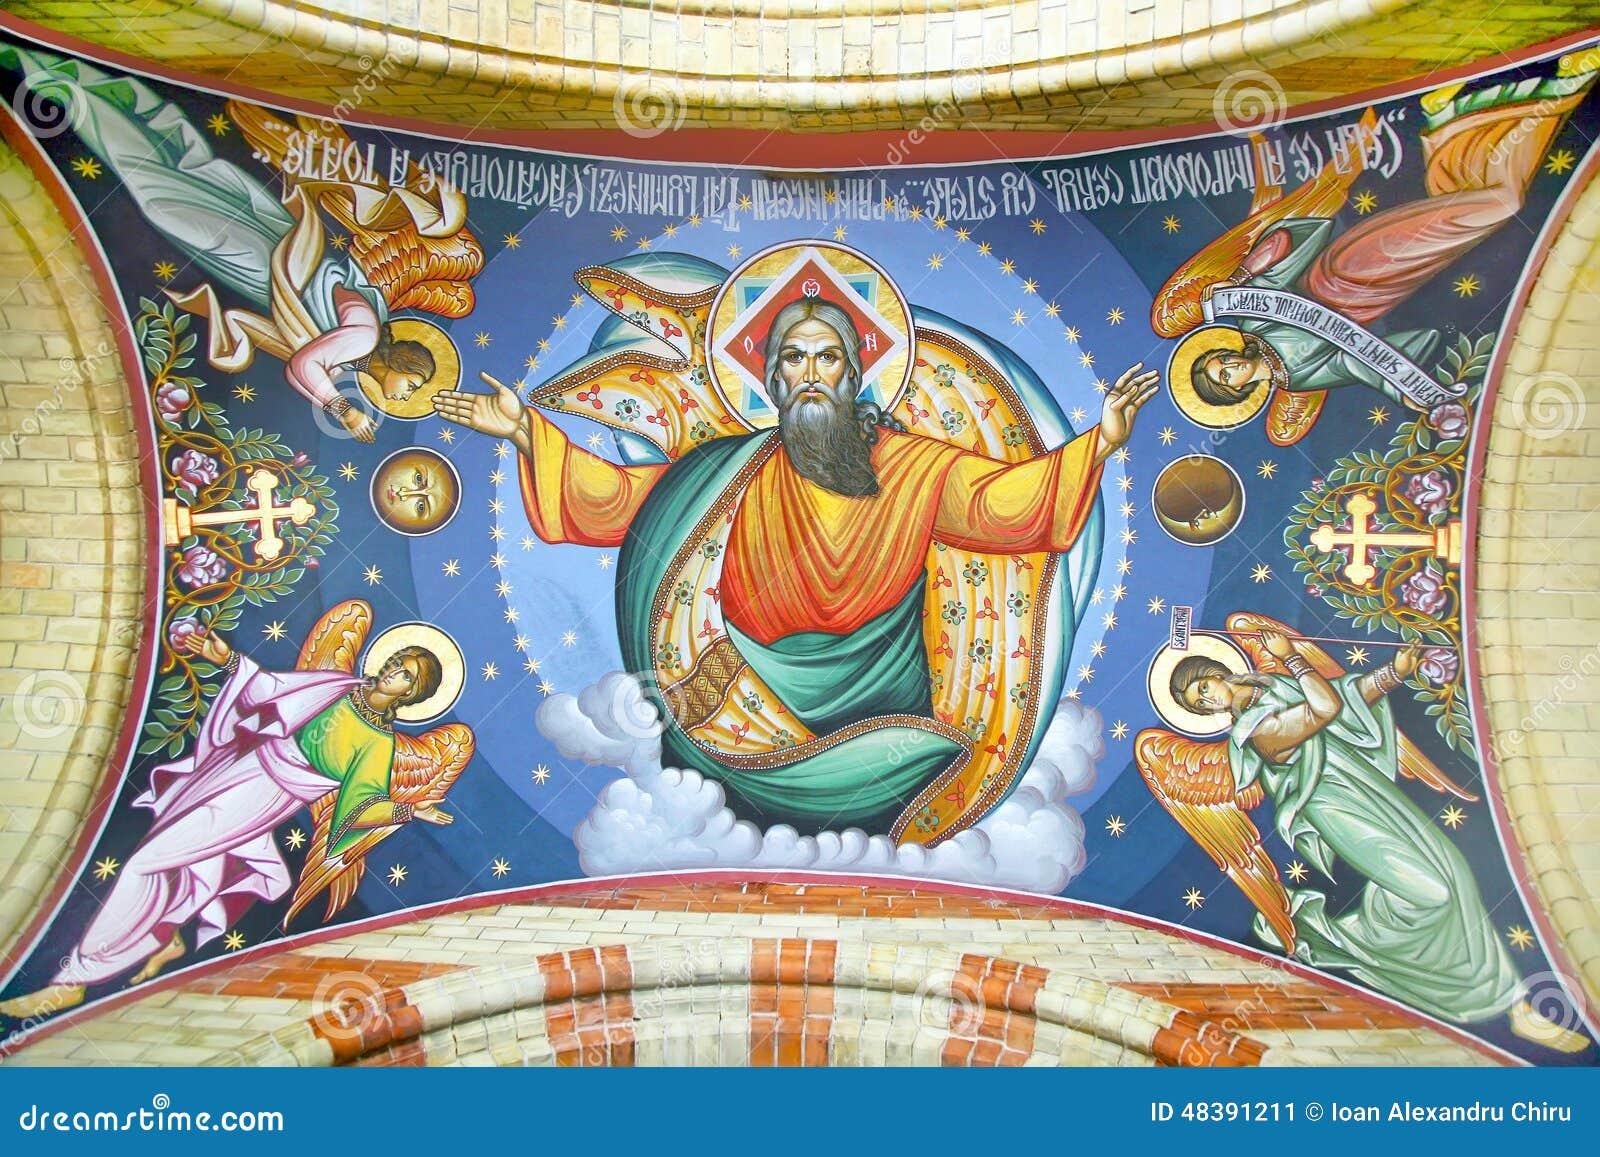 Exterior fresco on Cathedral of Sibiu